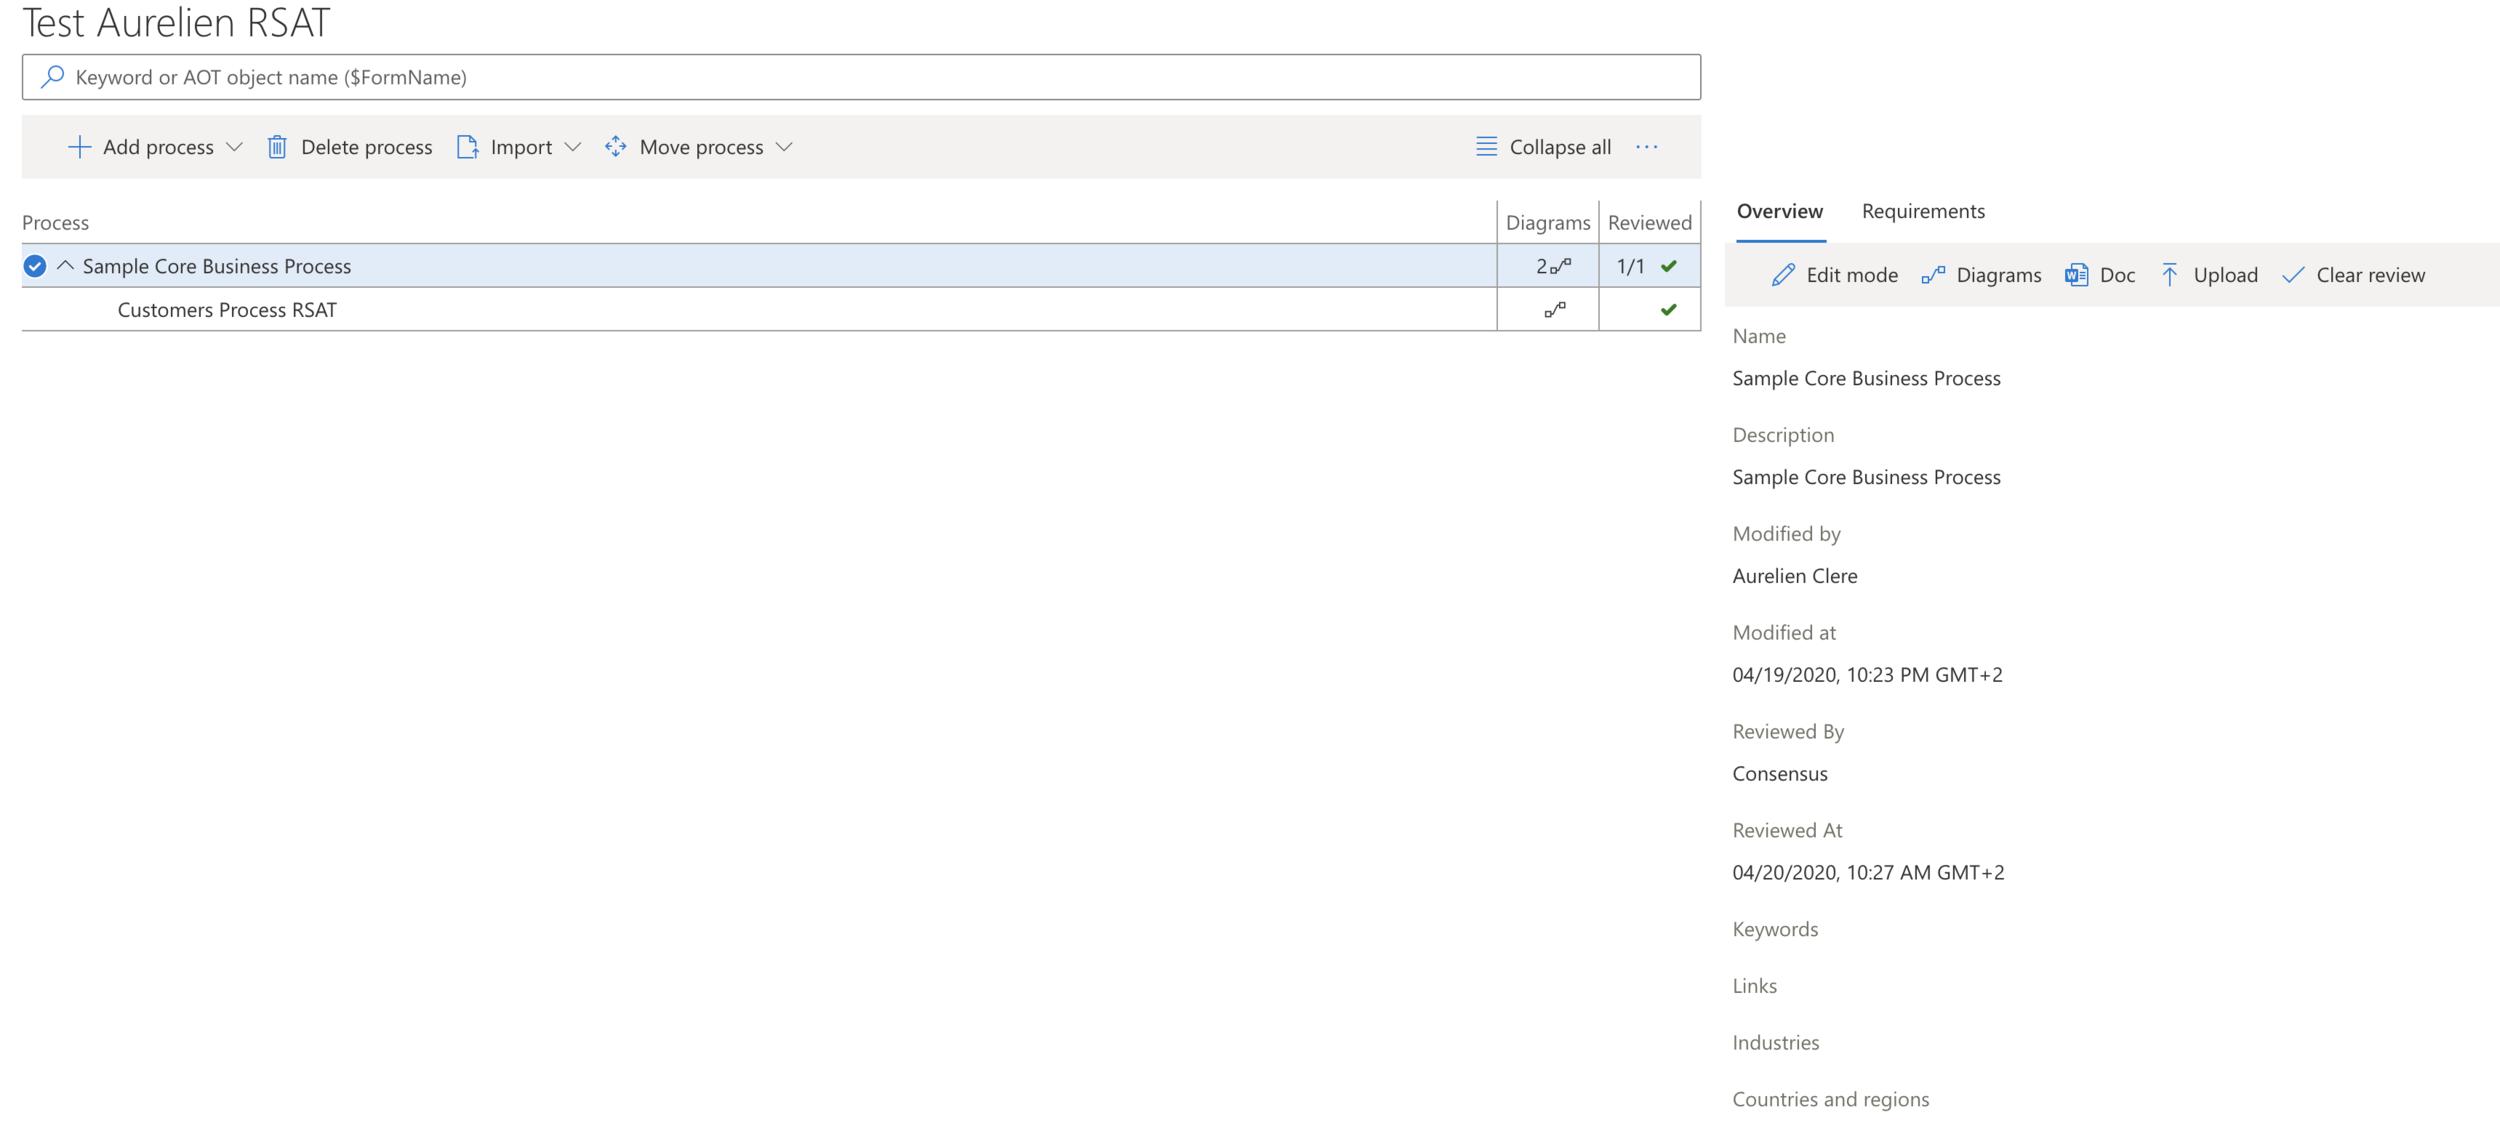 Screenshot 2020-04-20_21-25-13-784.png